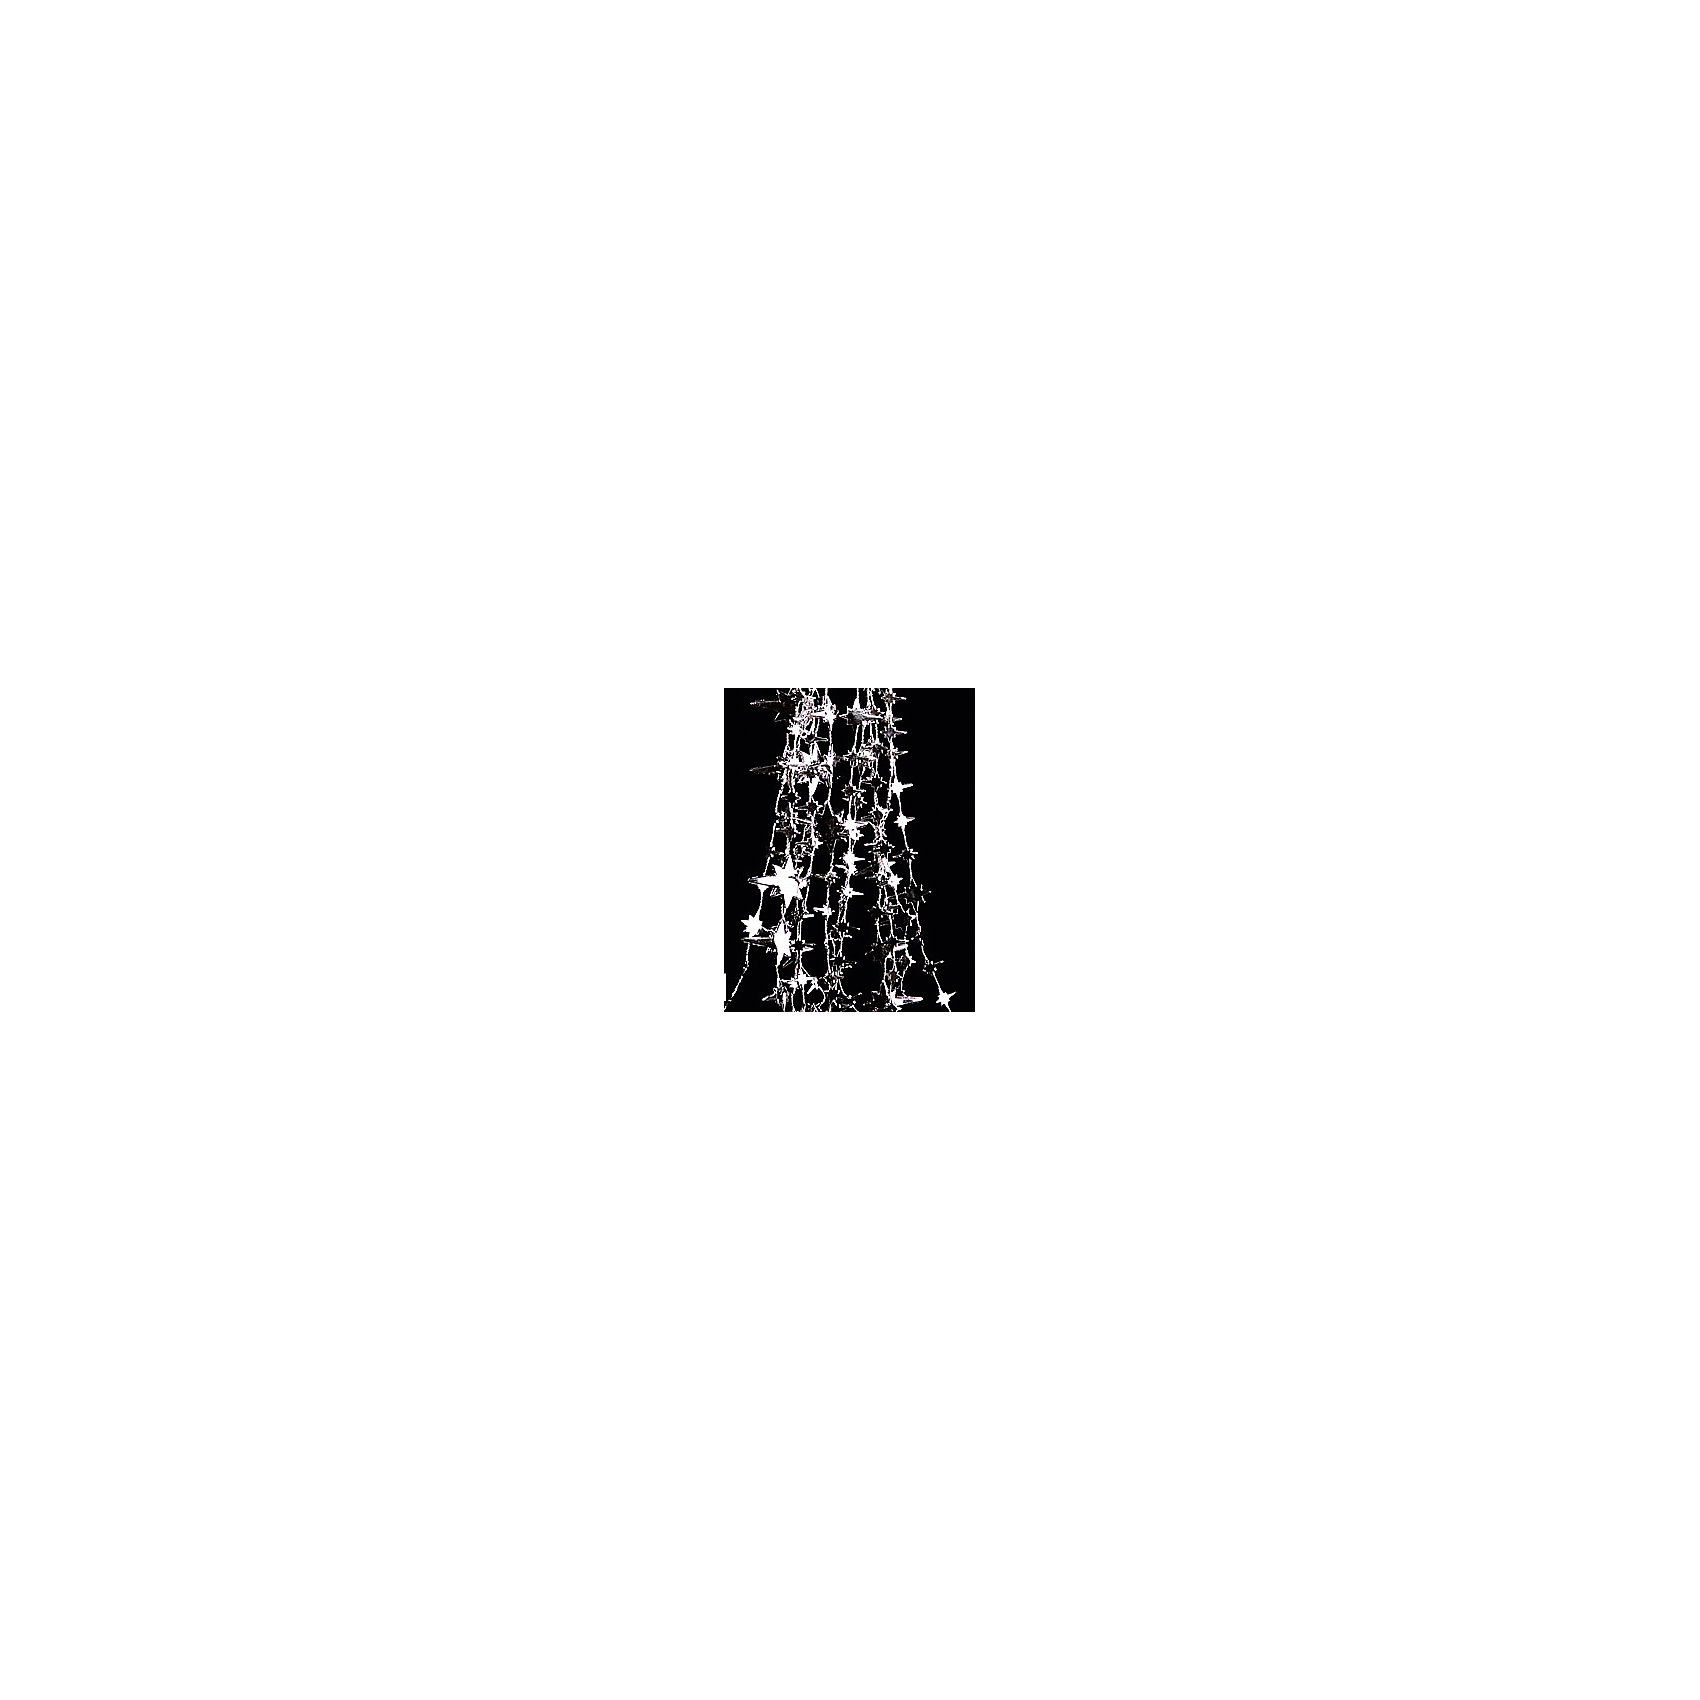 Бусы Звезды 2,7 м, сереброВсё для праздника<br>Изготовлено из пластмассы. ёл. укр. бусы ЗВЕЗДЫ ост, сред/мал,2,7м, серебро<br><br>Ширина мм: 120<br>Глубина мм: 10<br>Высота мм: 220<br>Вес г: 100<br>Возраст от месяцев: 36<br>Возраст до месяцев: 2147483647<br>Пол: Унисекс<br>Возраст: Детский<br>SKU: 5101093